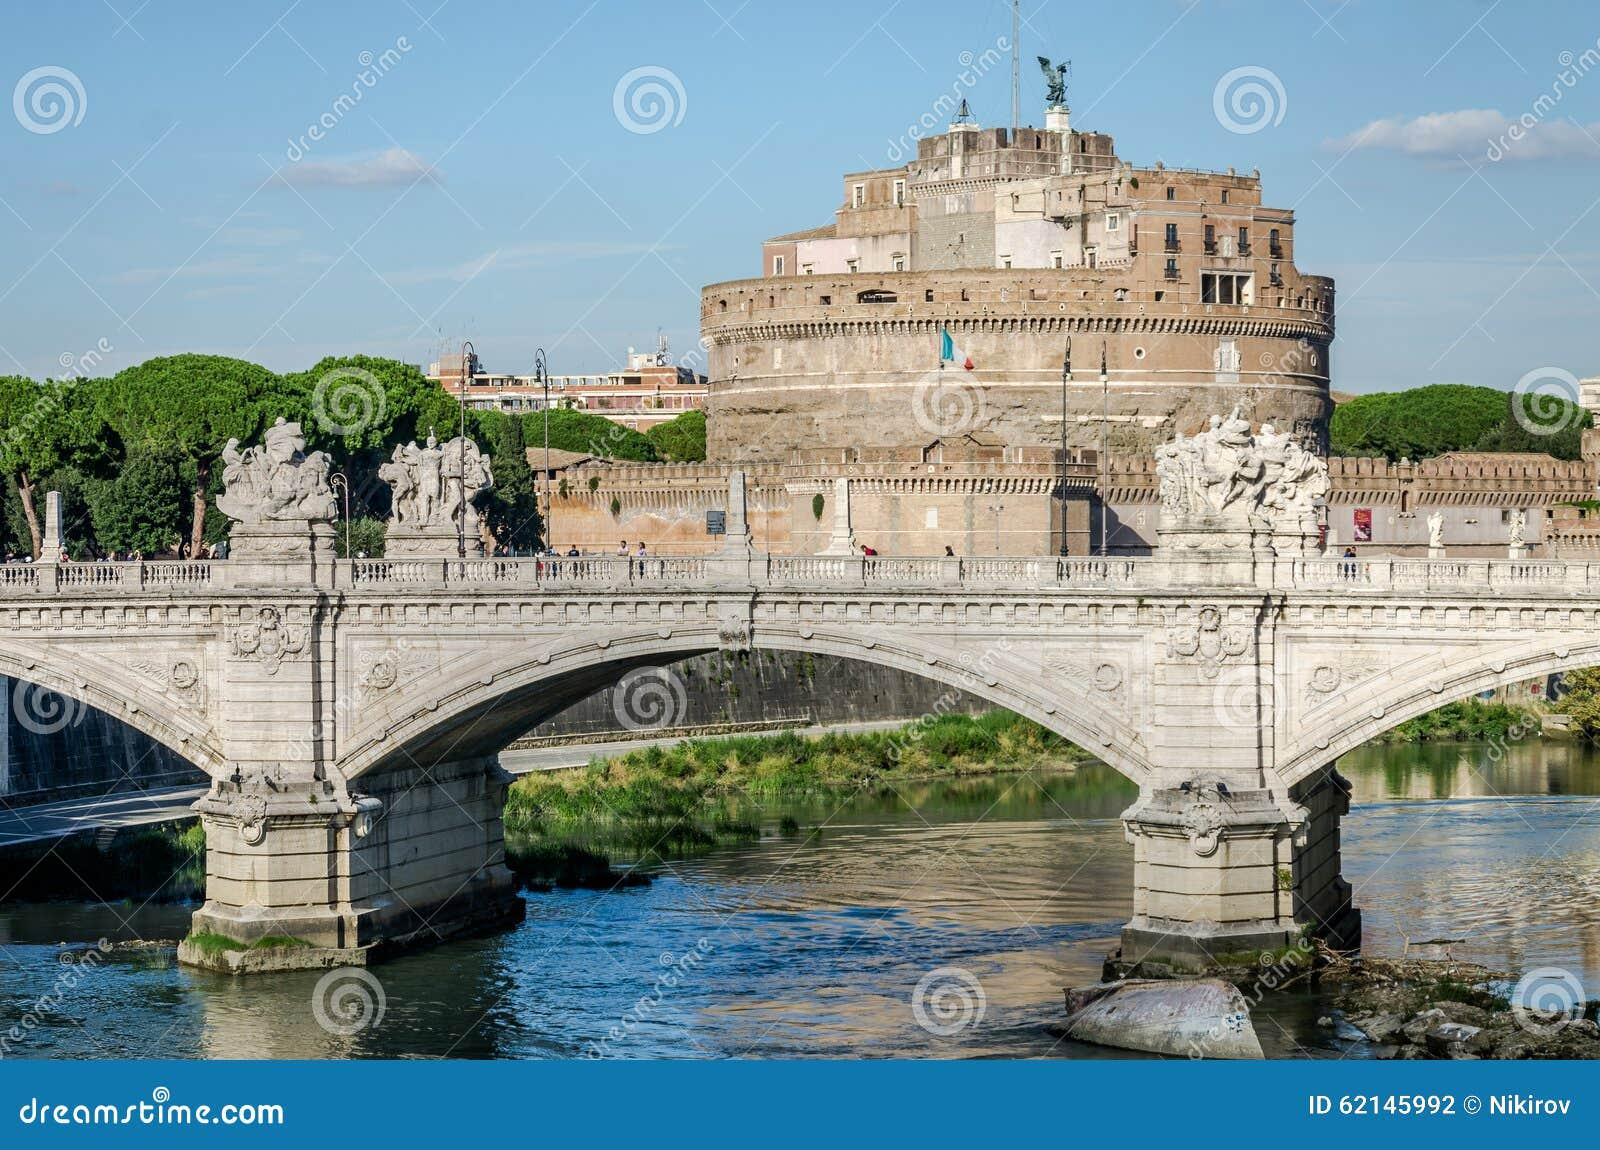 Historic Sights Of Building Architecture Castel Sant